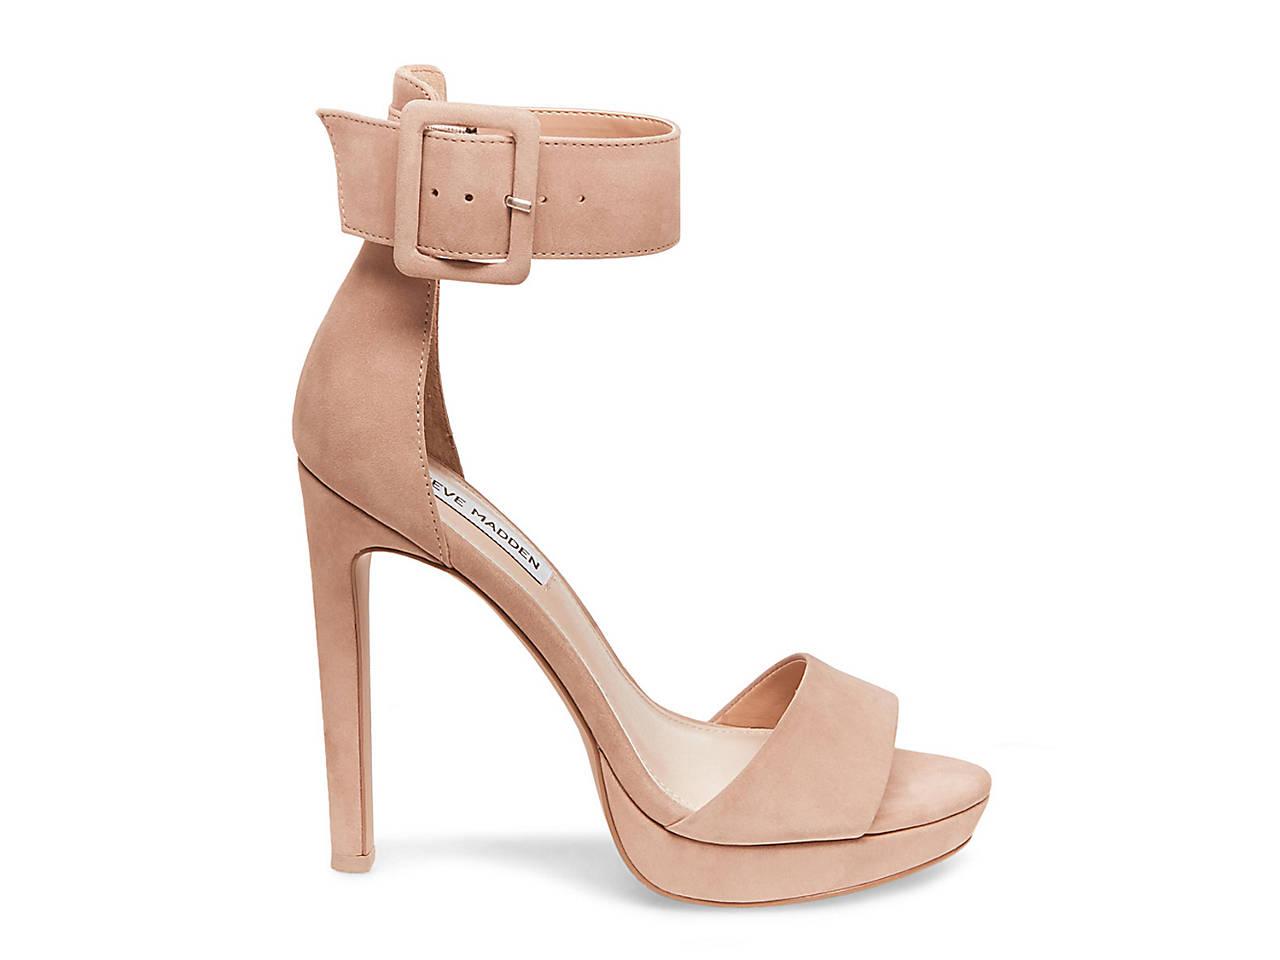 249a7c5b8e905 Home · Women's Shoes · Sandals; Circuit Sandal. previous. Circuit Sandal.  next